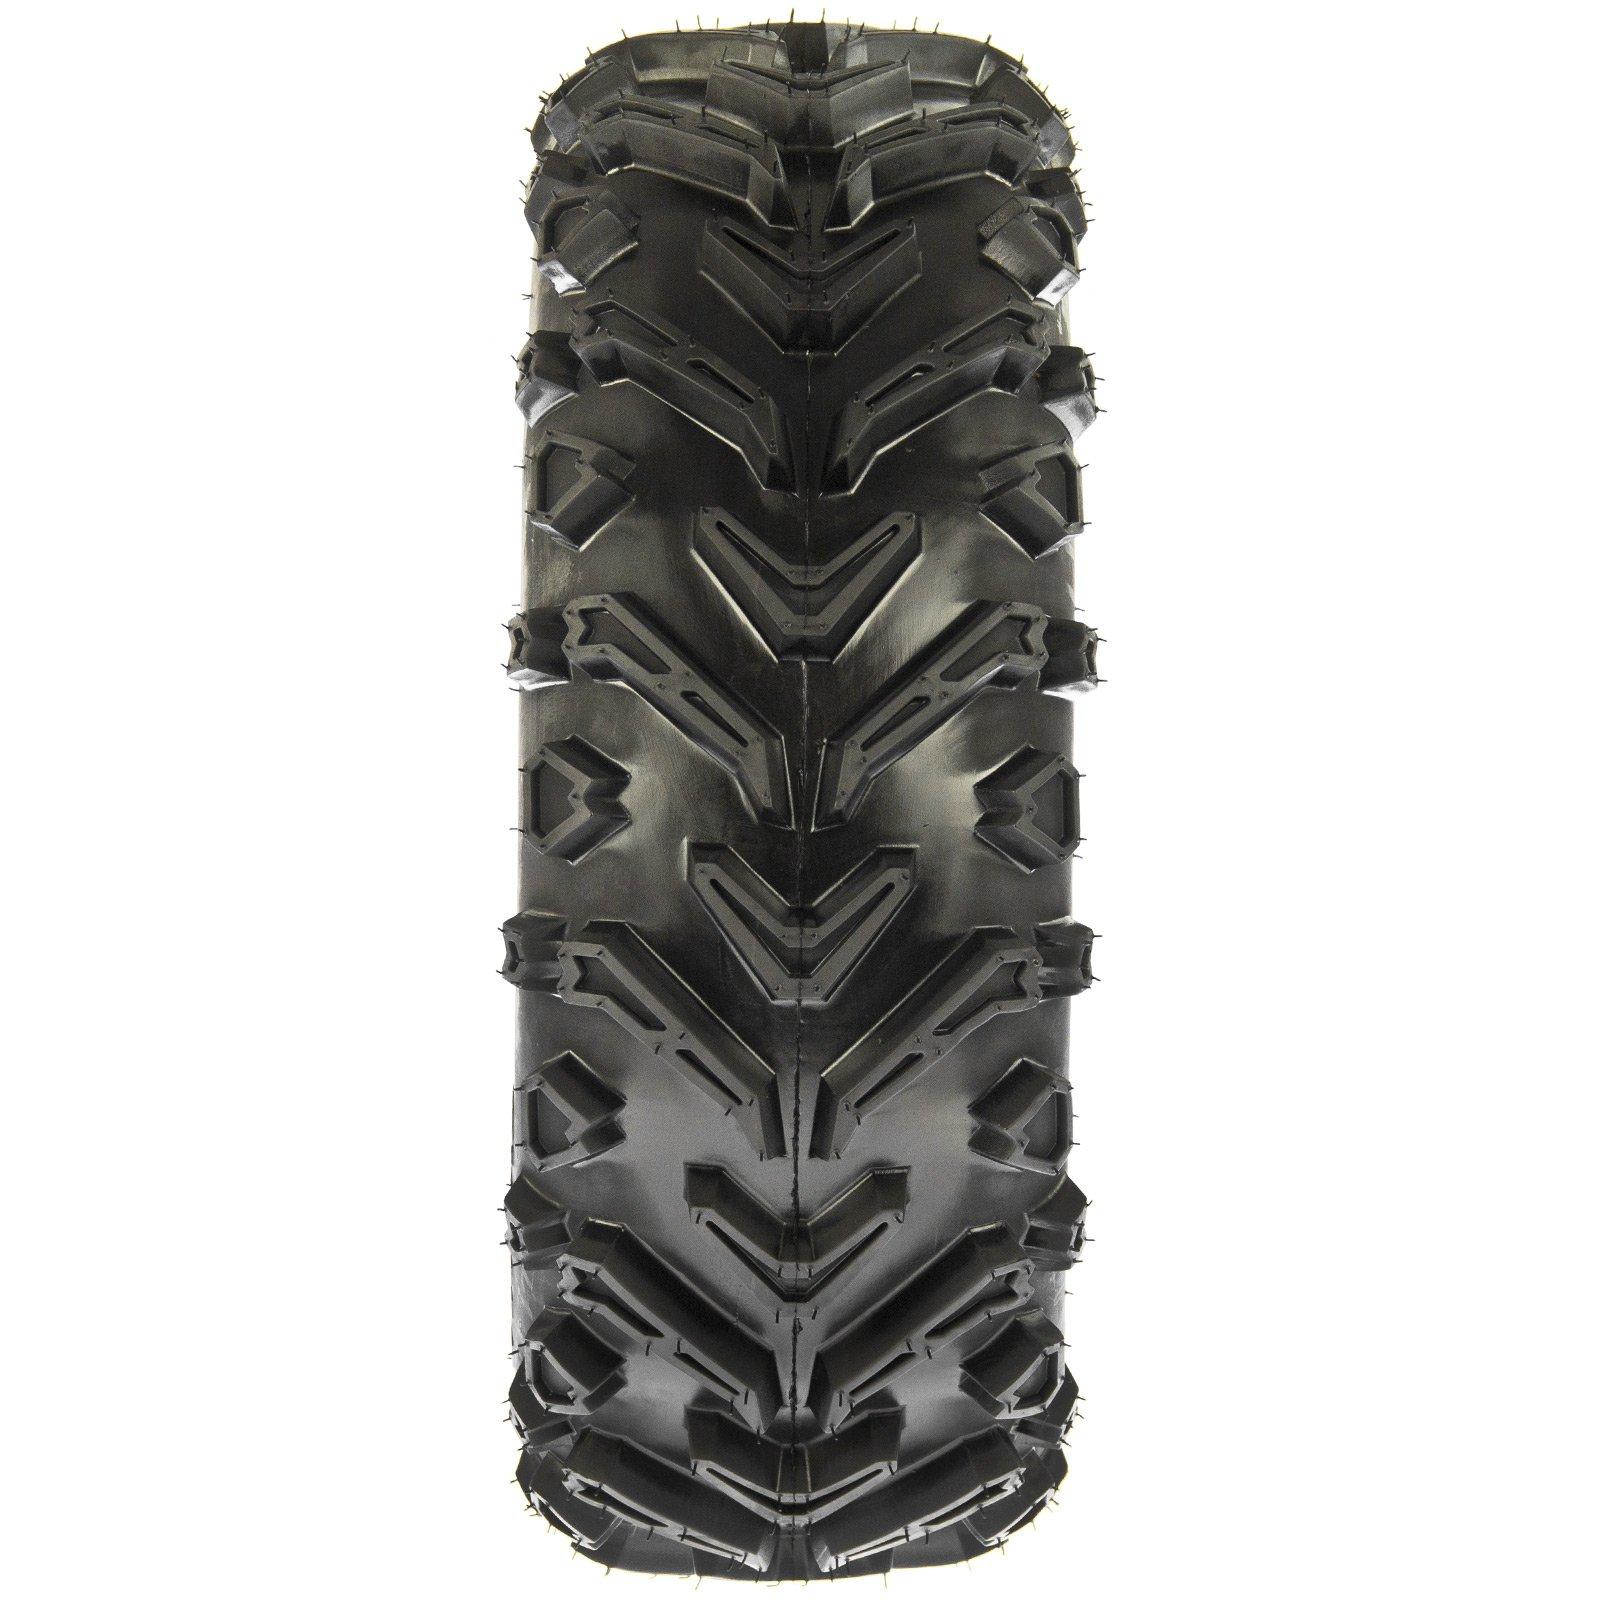 SunF 24x8-12 24x8x12 All Terrain Mud ATV UTV Tires 6 PR A041 (Set pair of 2) by SunF (Image #6)